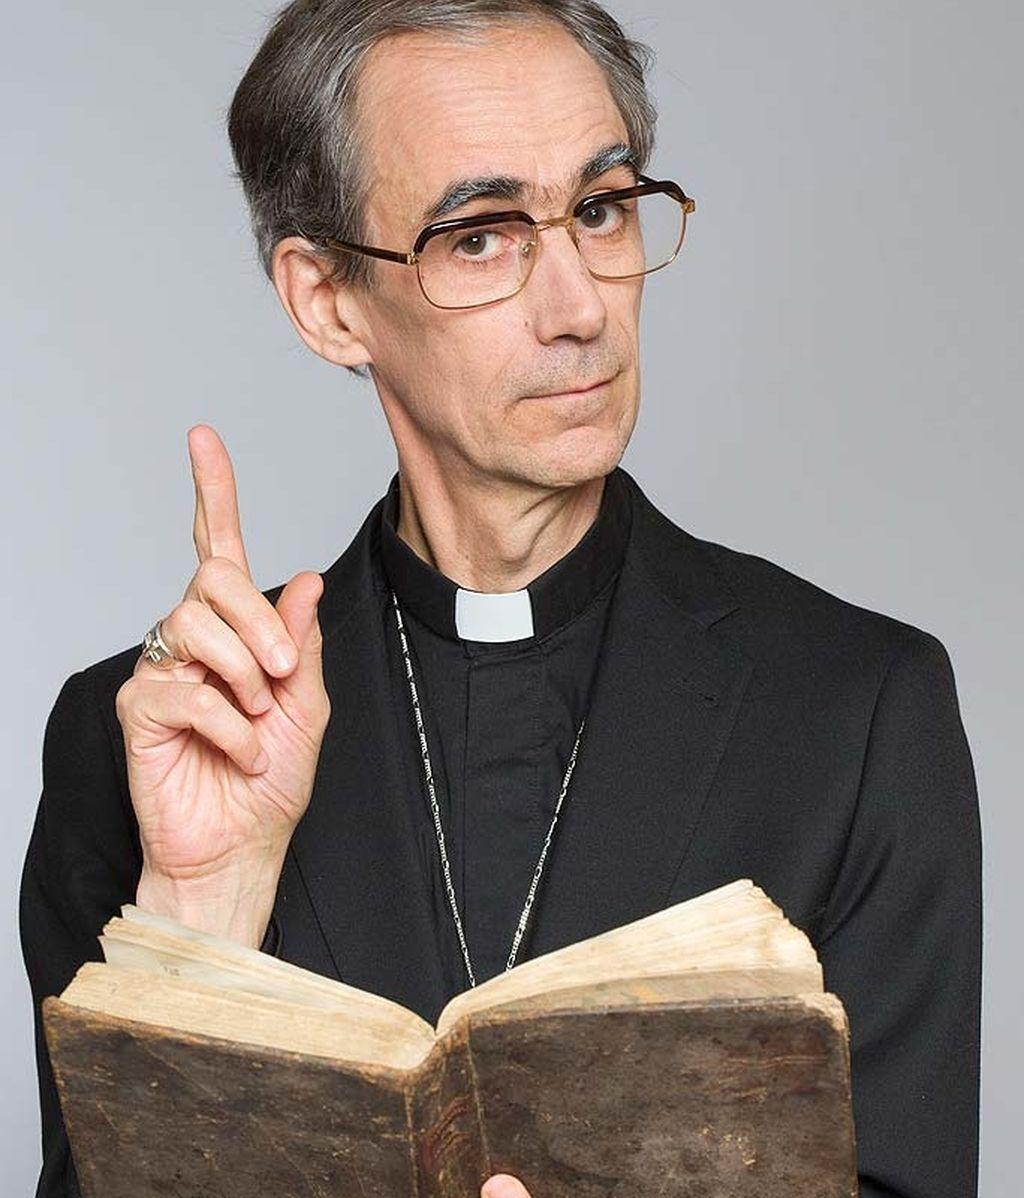 Obispo Martínez Carrión (César Sarachu)